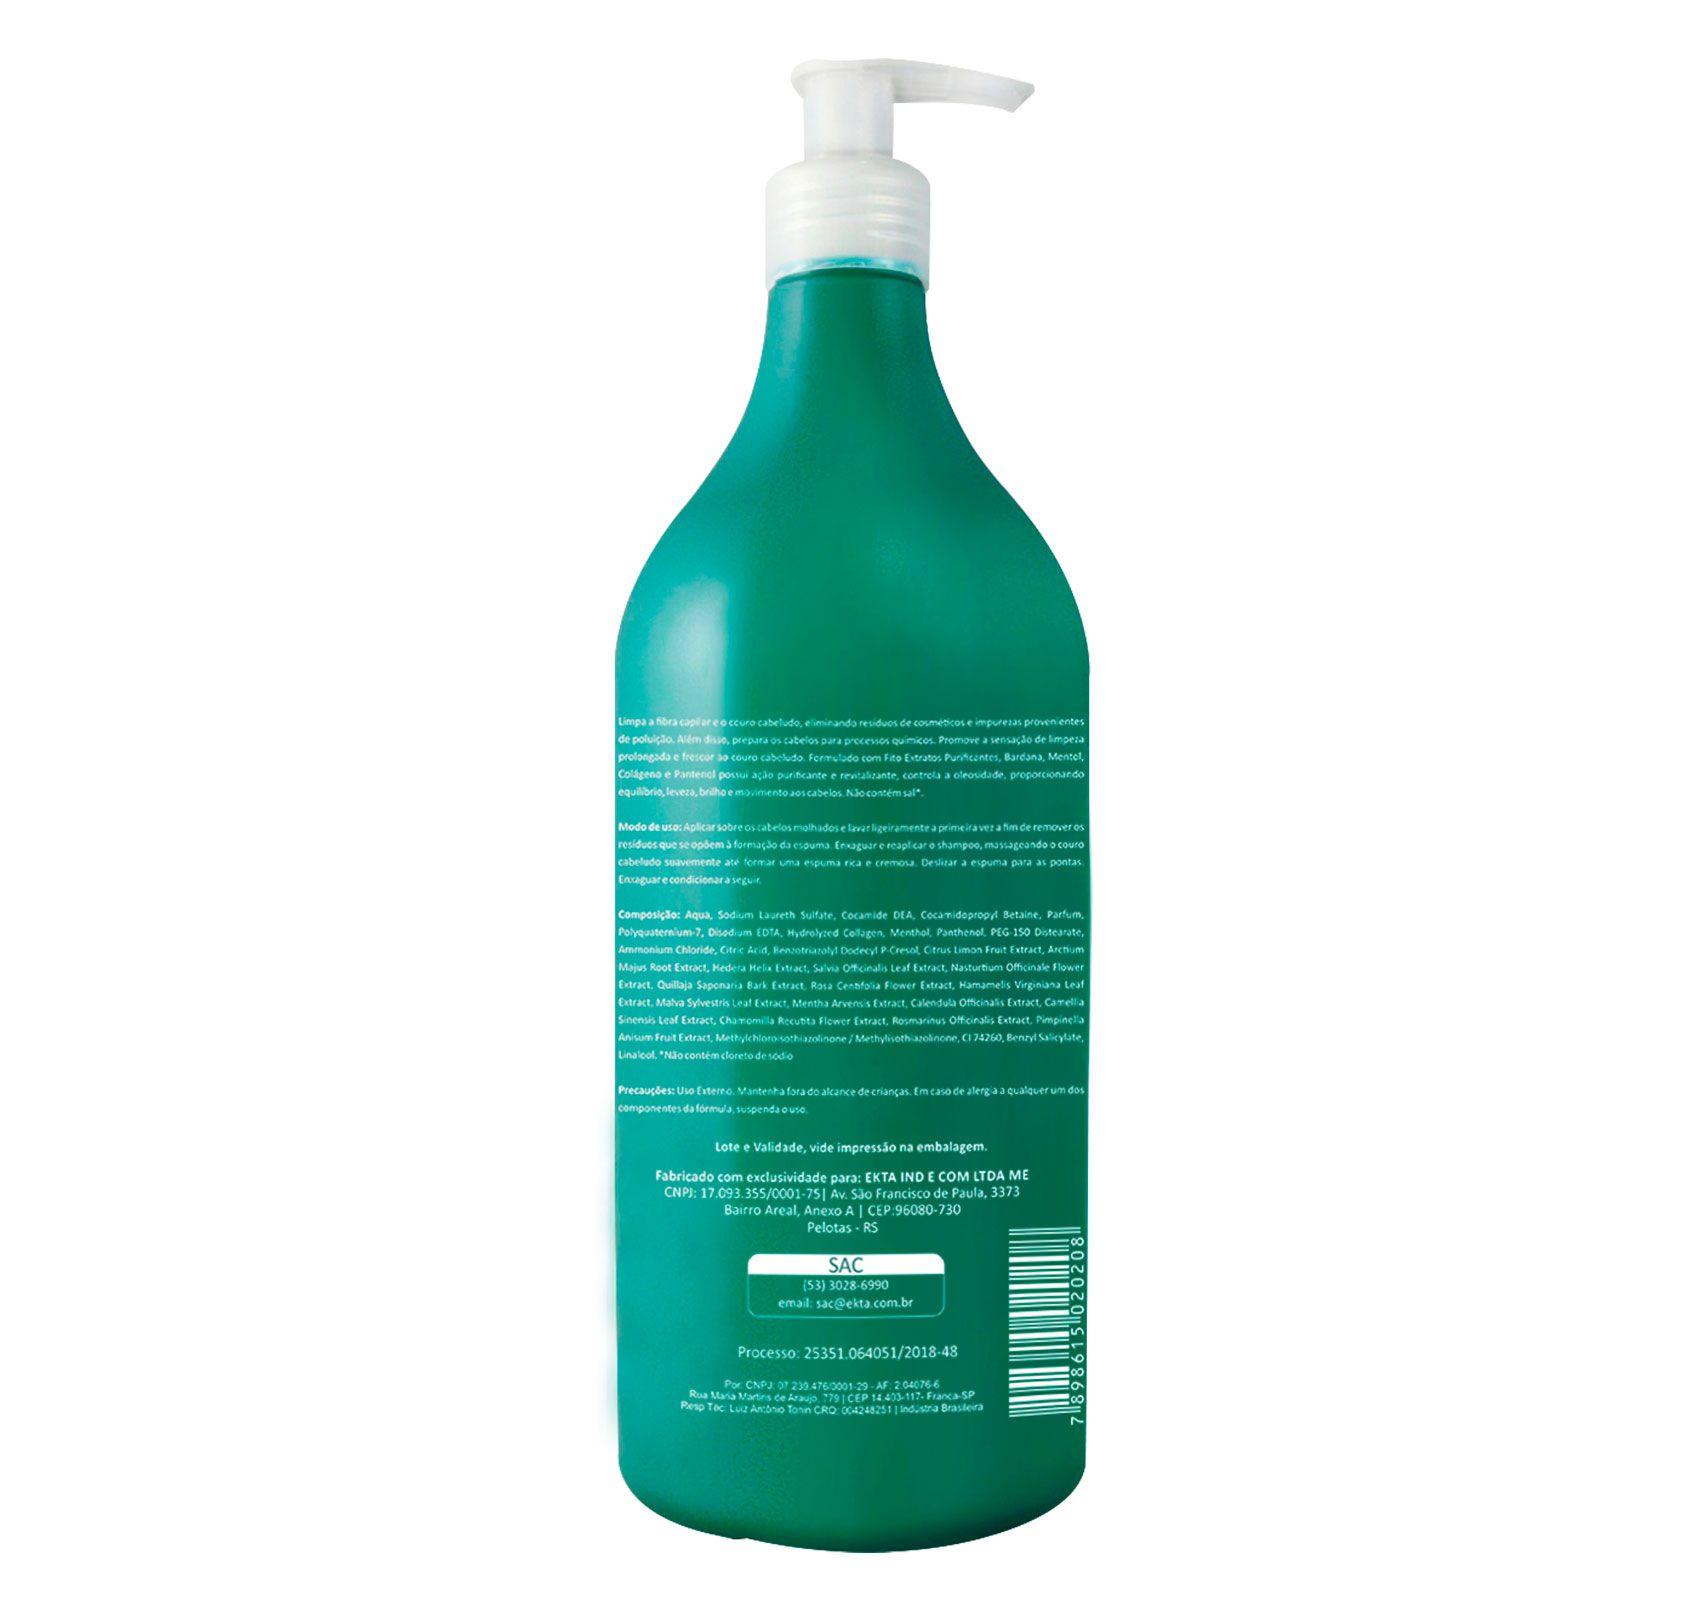 Shampoo Purify Detox (1L)